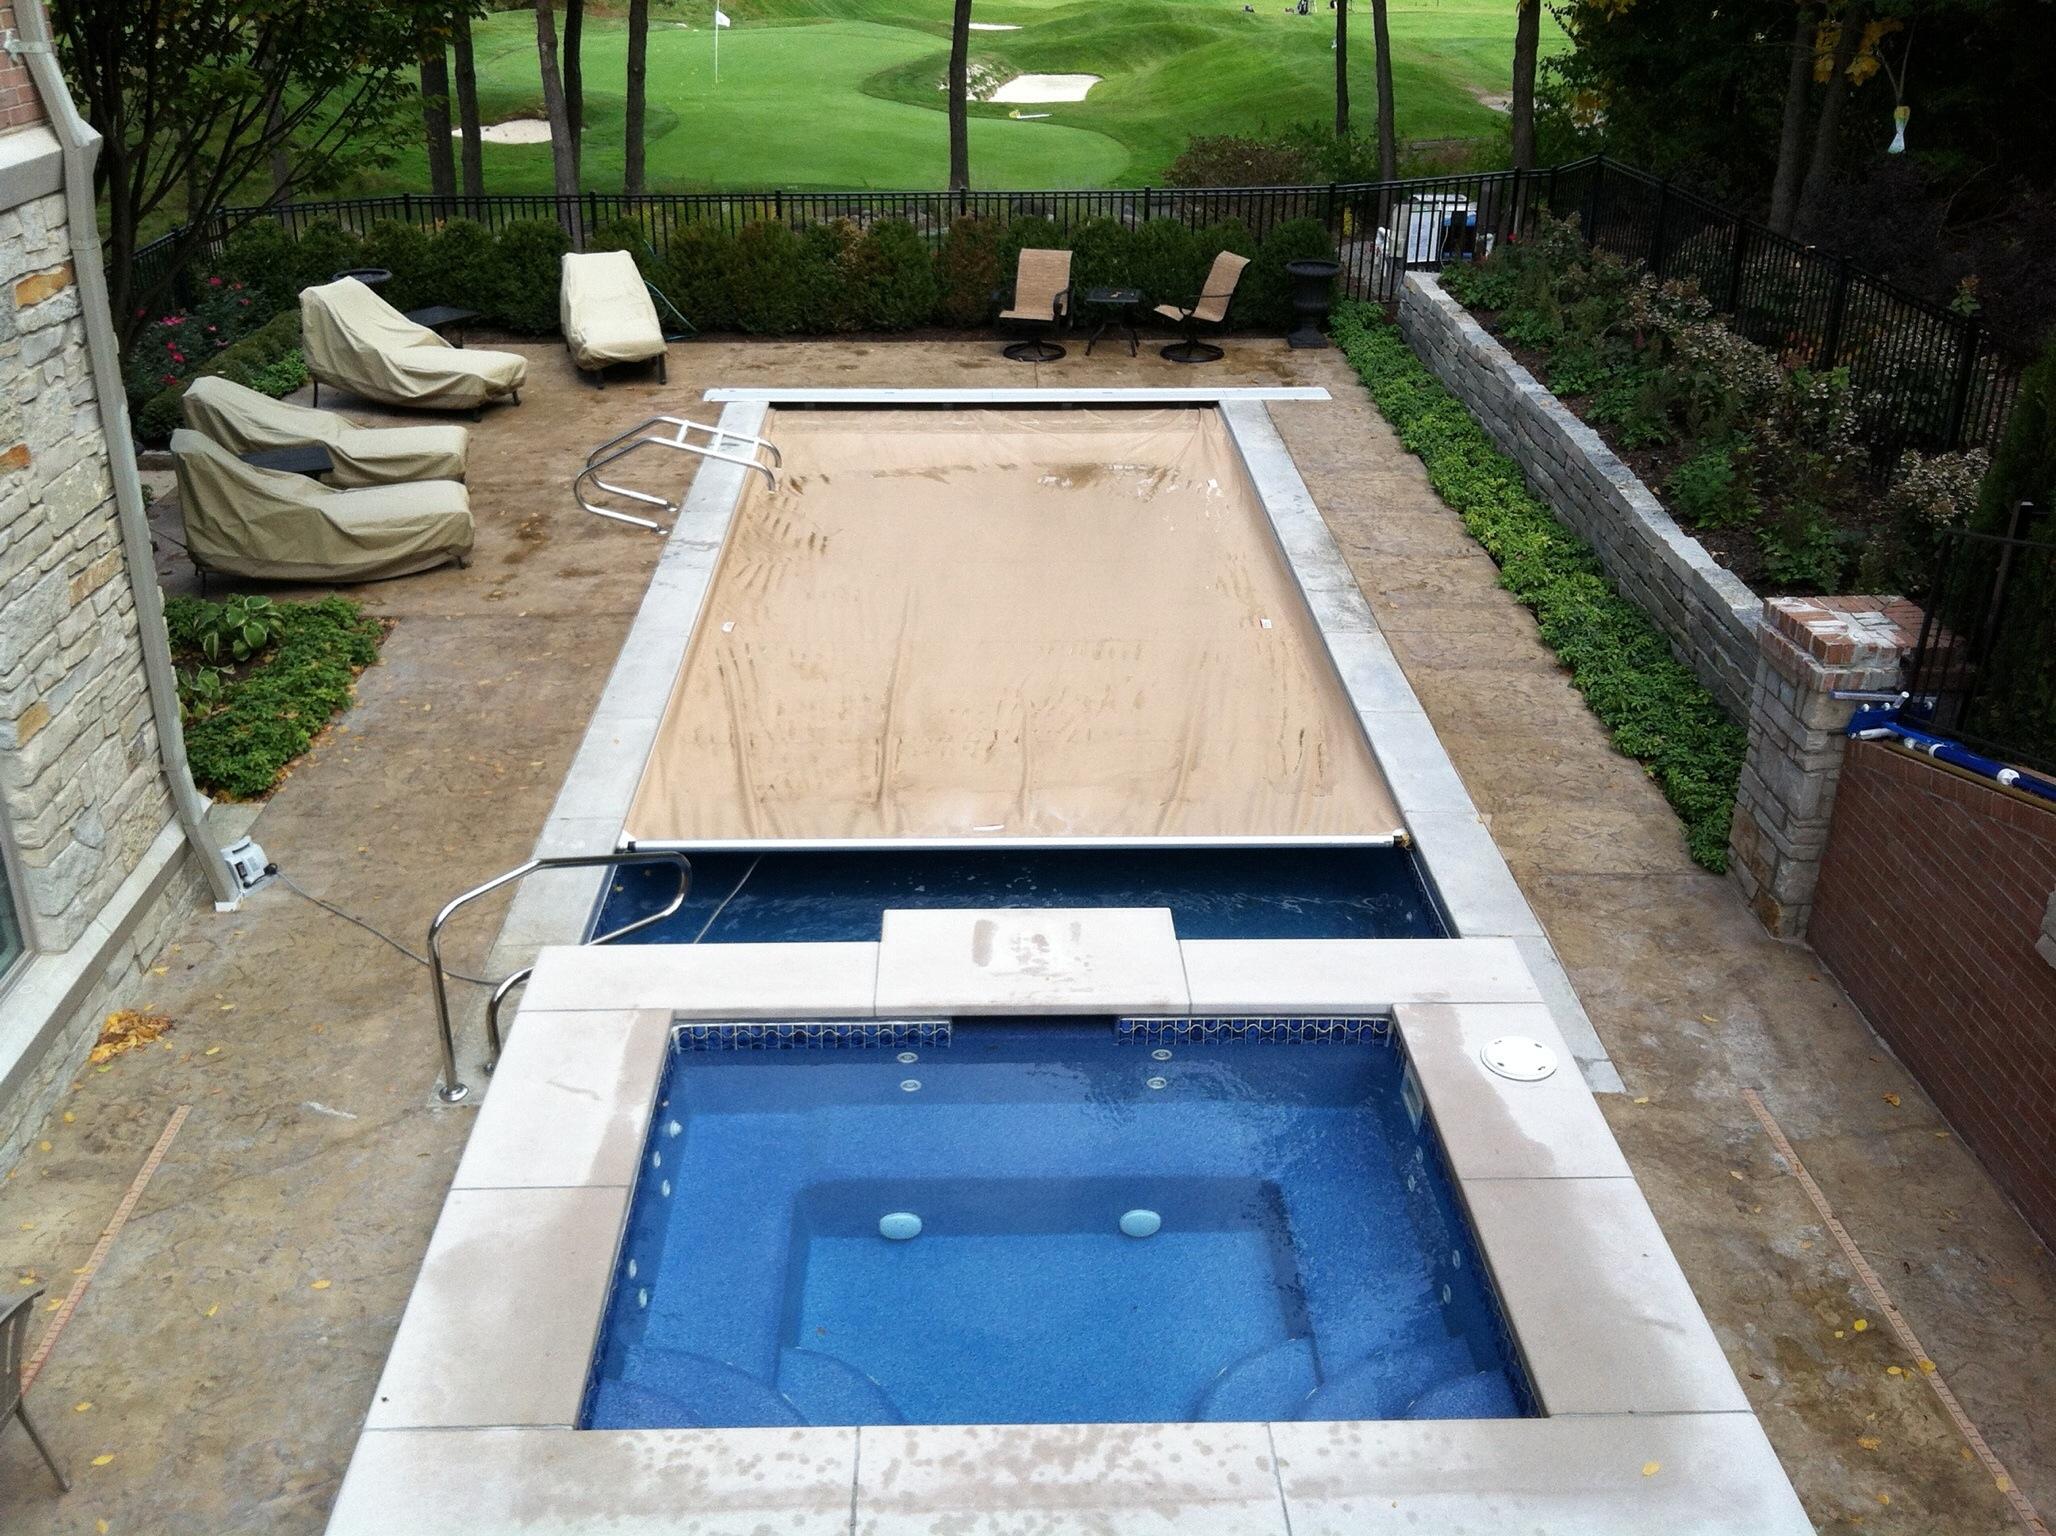 Blue Hawaiian Inground Pools Of Michigan Inground Swimming Pools In Michigan